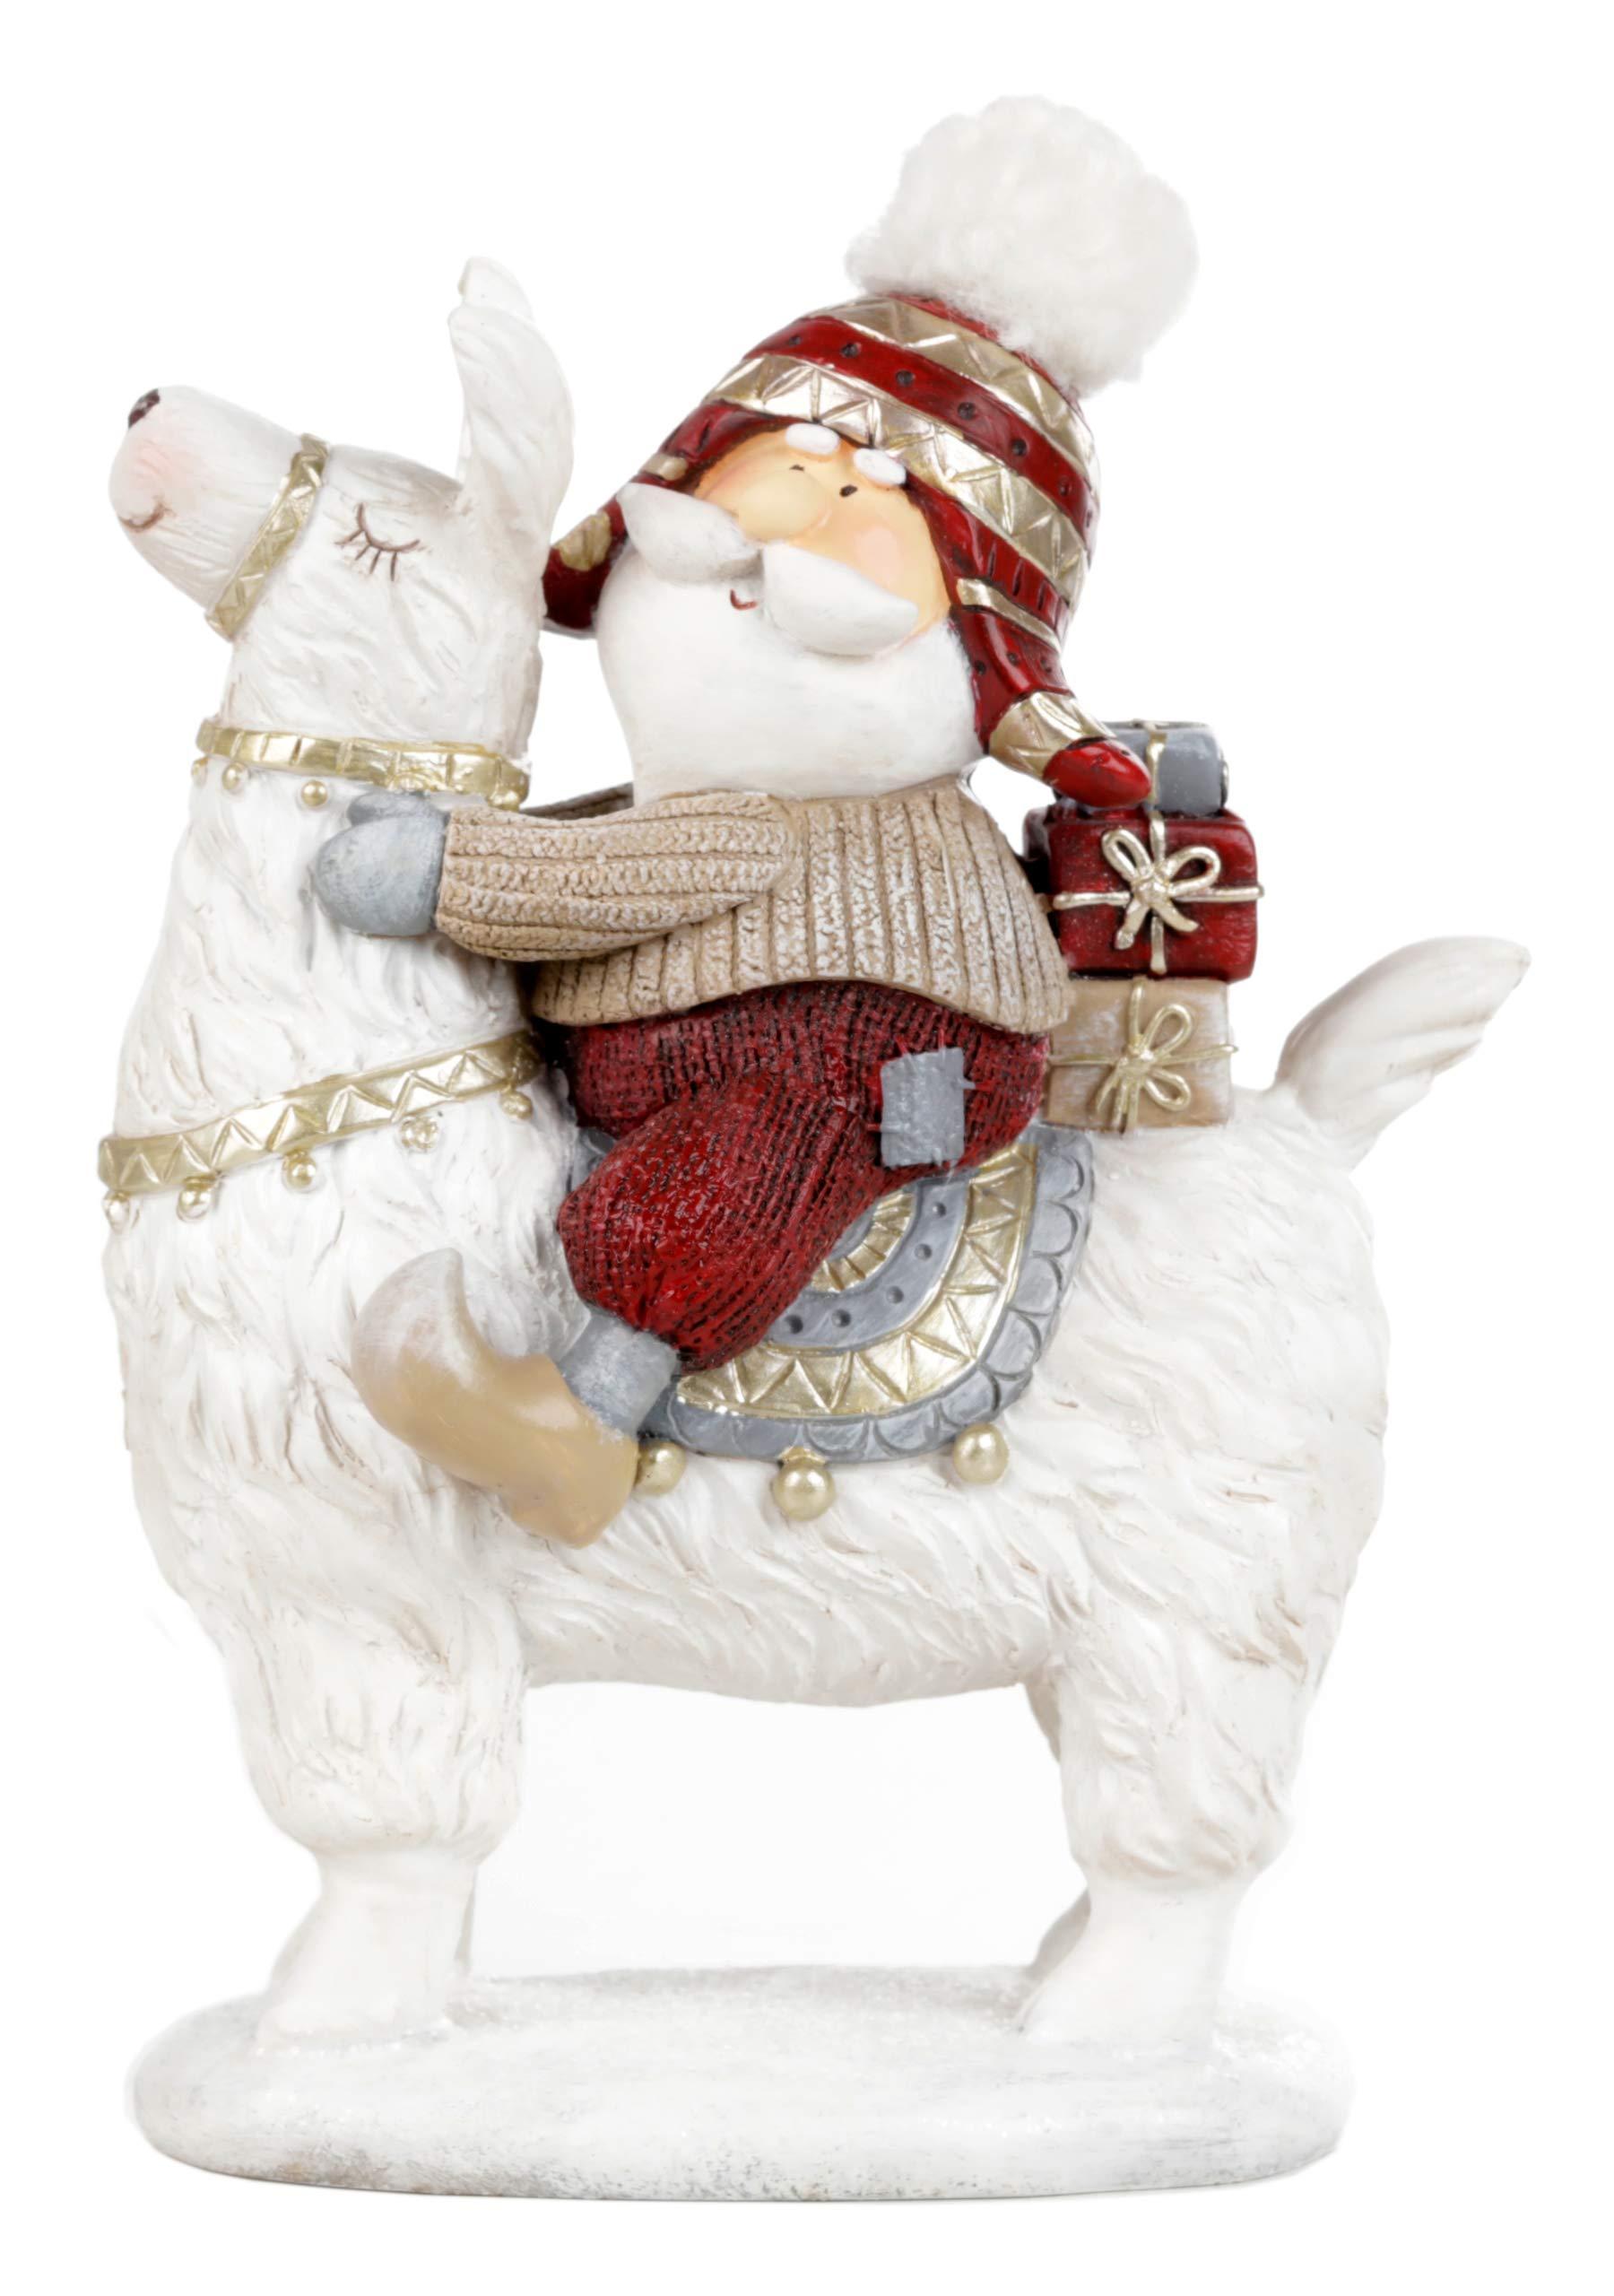 Image of A Favorite: Super Cute Santa Riding a Llama Christmas Figurine